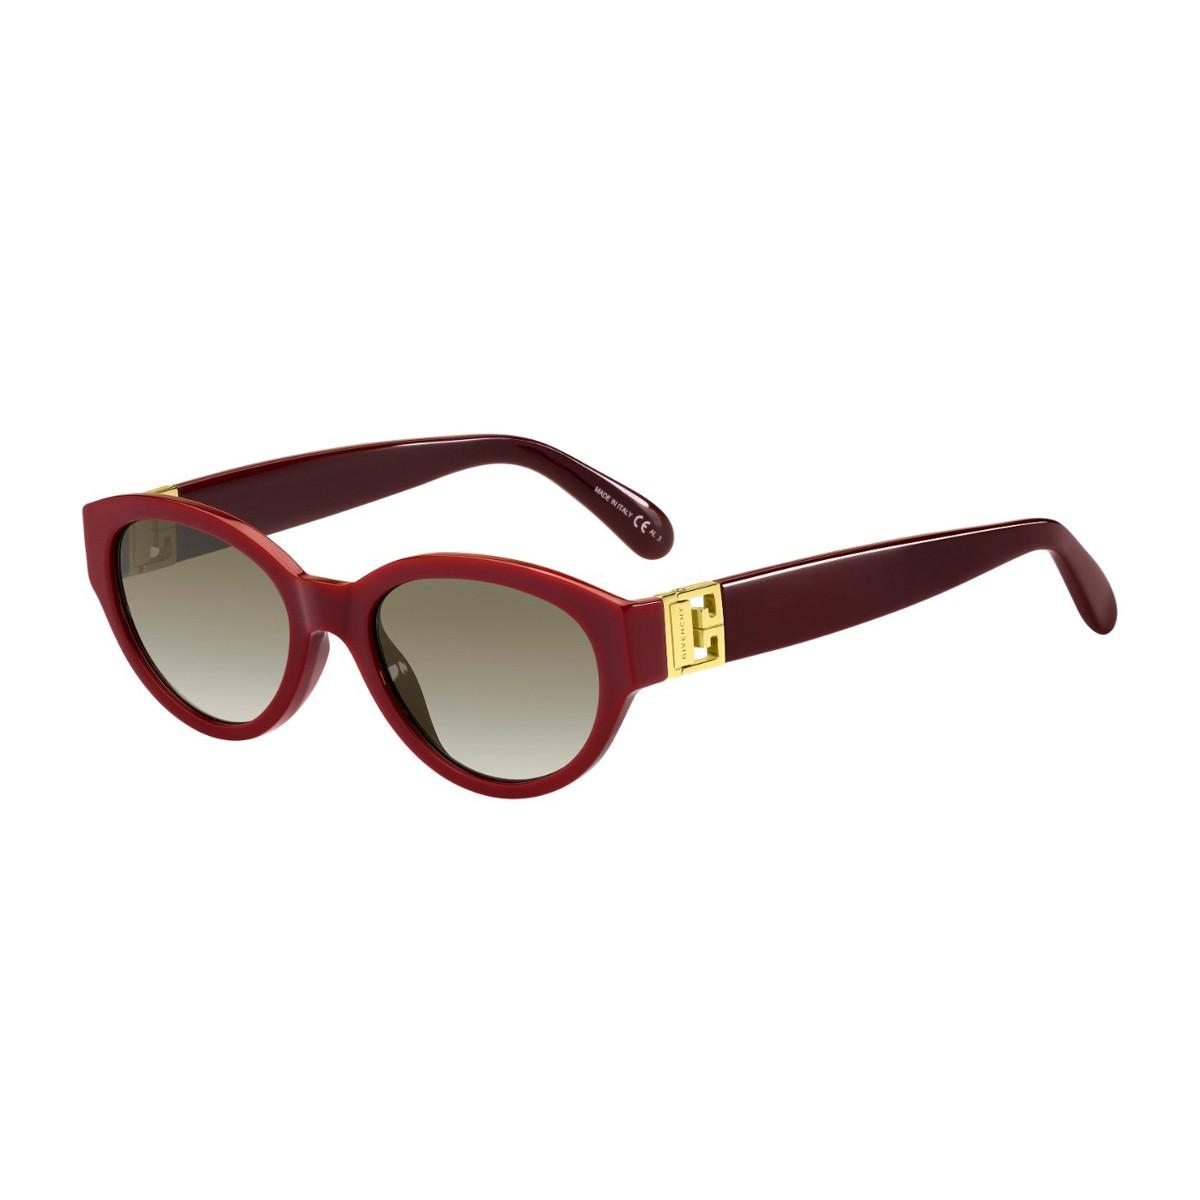 Givenchy GV7143/s | Occhiali da sole Donna